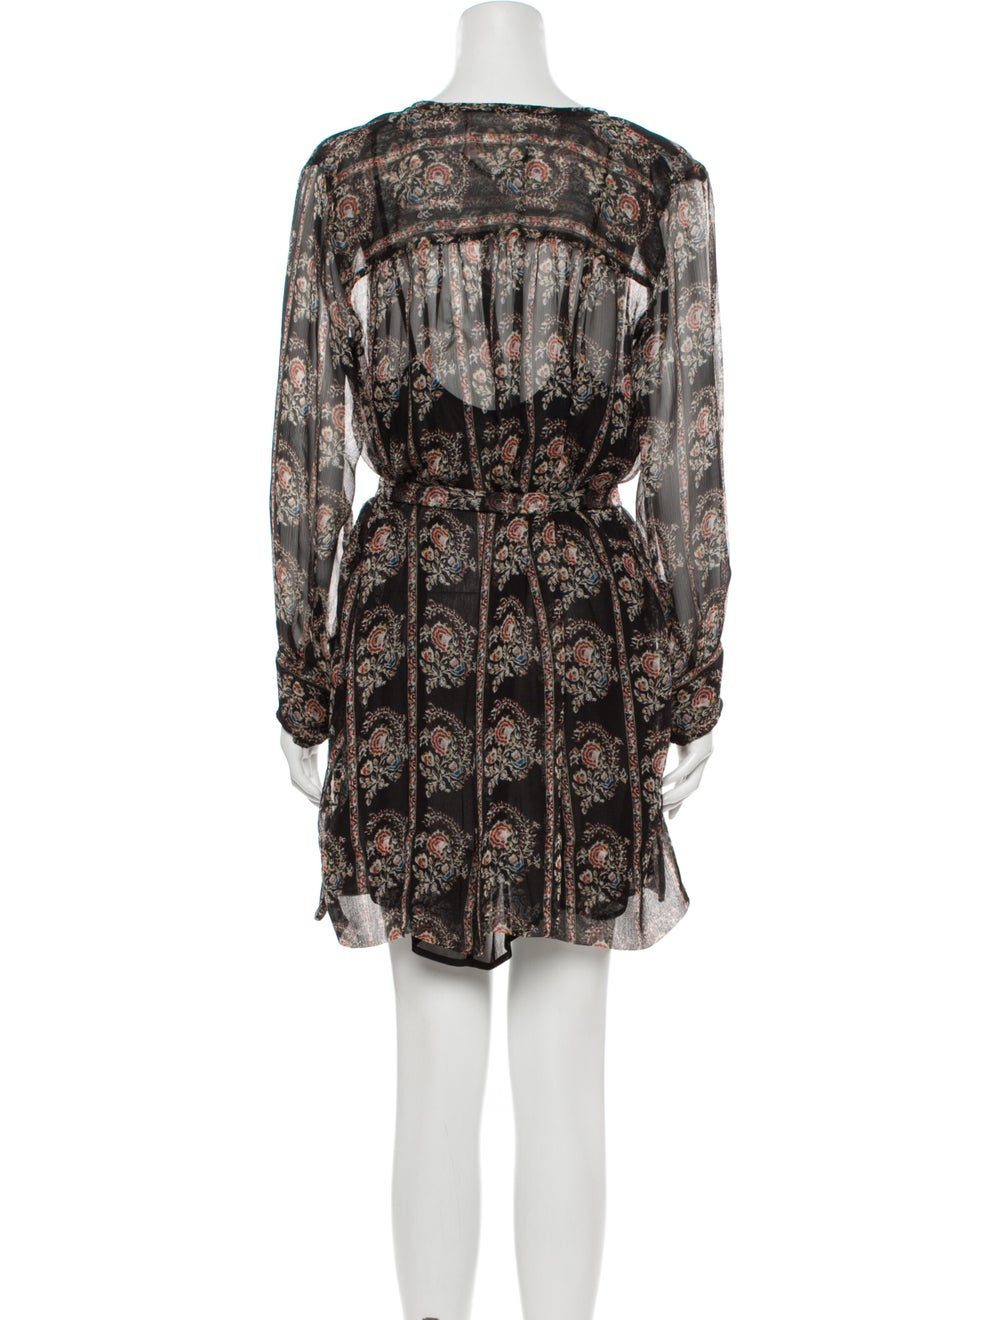 Isabel Marant Paisley Print Mini Dress Black - image 3